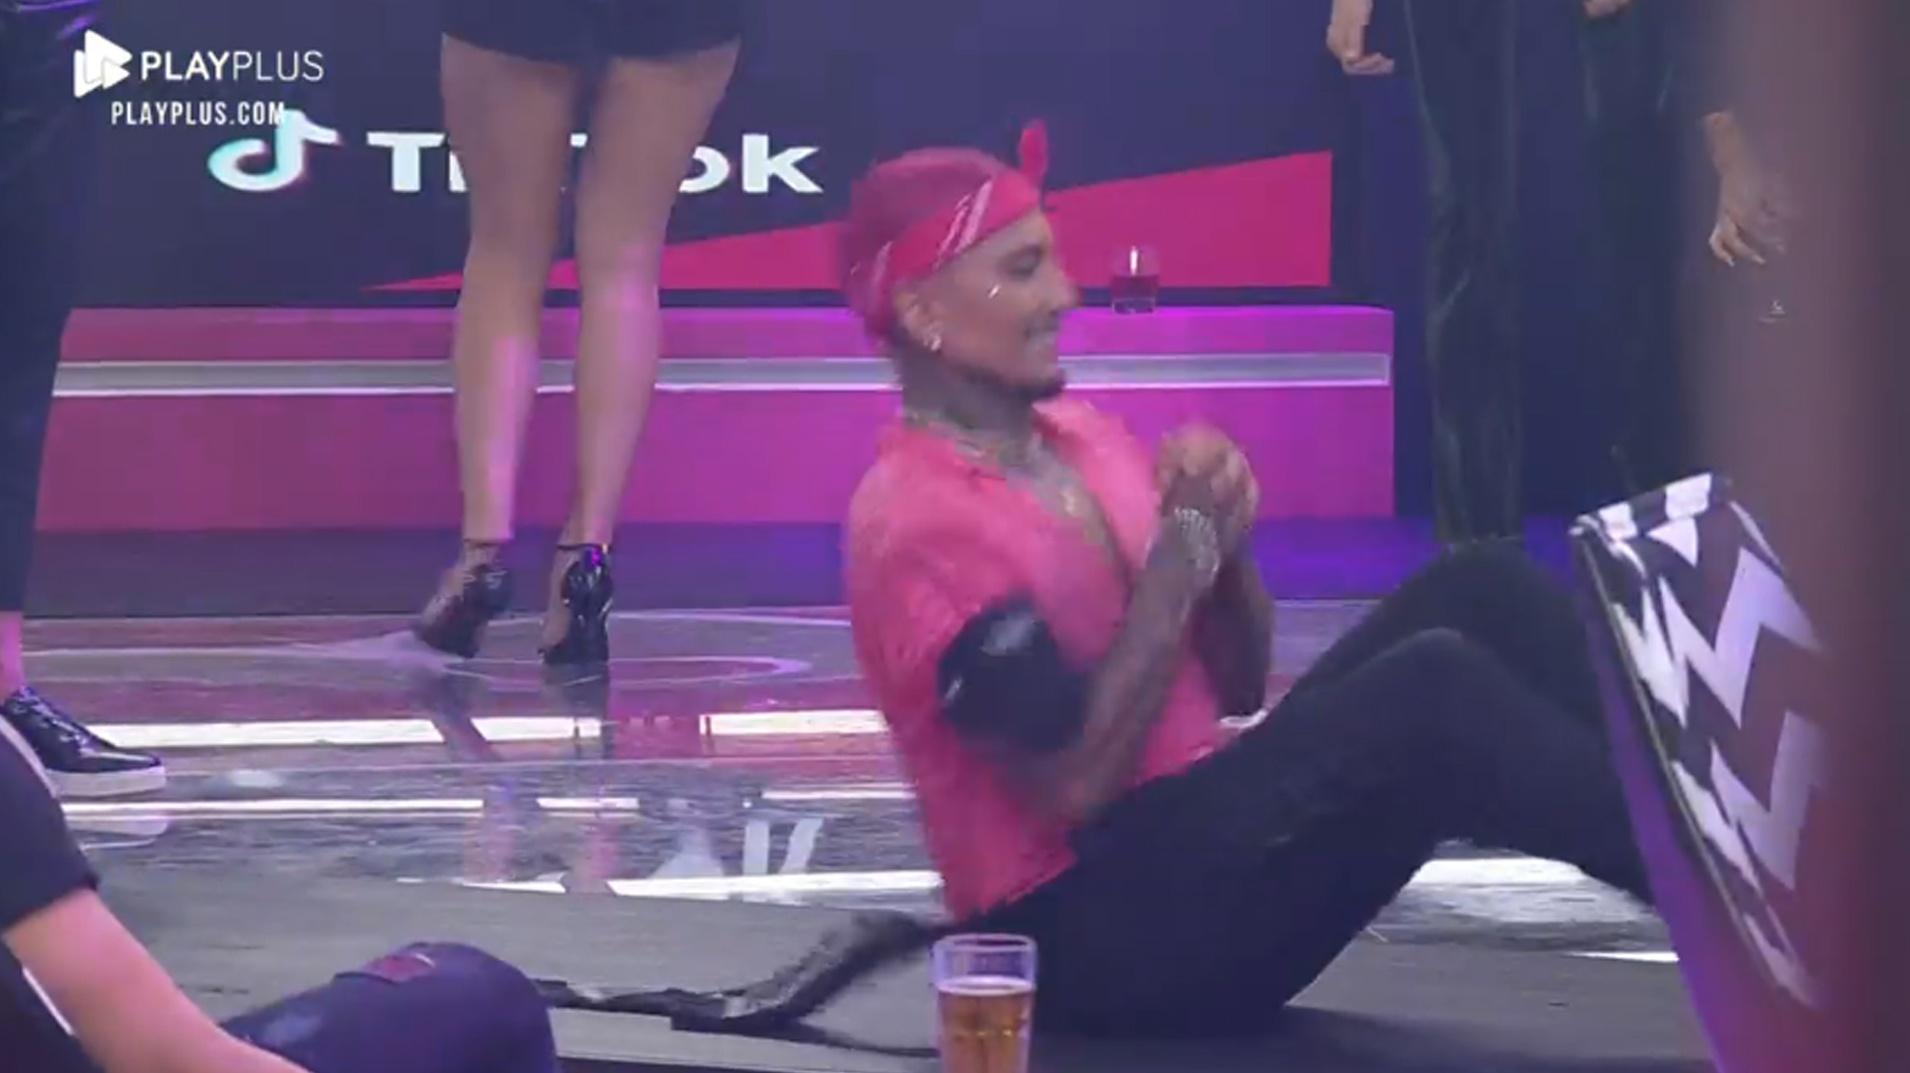 A Fazenda 2021: Dynho Alves Brings a Dance Show at the Party - clone/Playplus